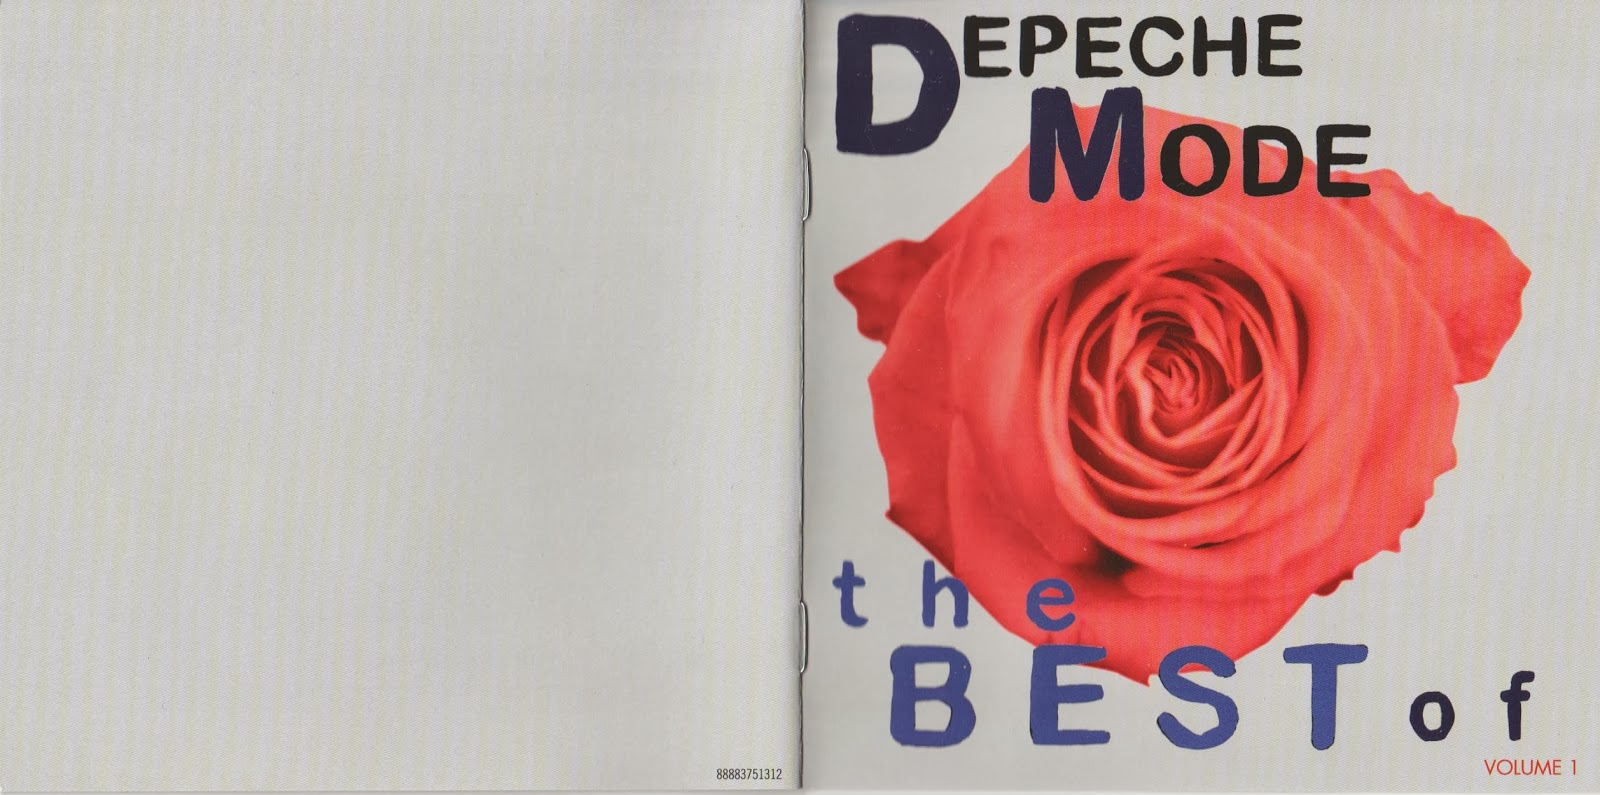 Depeche mode the best of volume 1 mp3